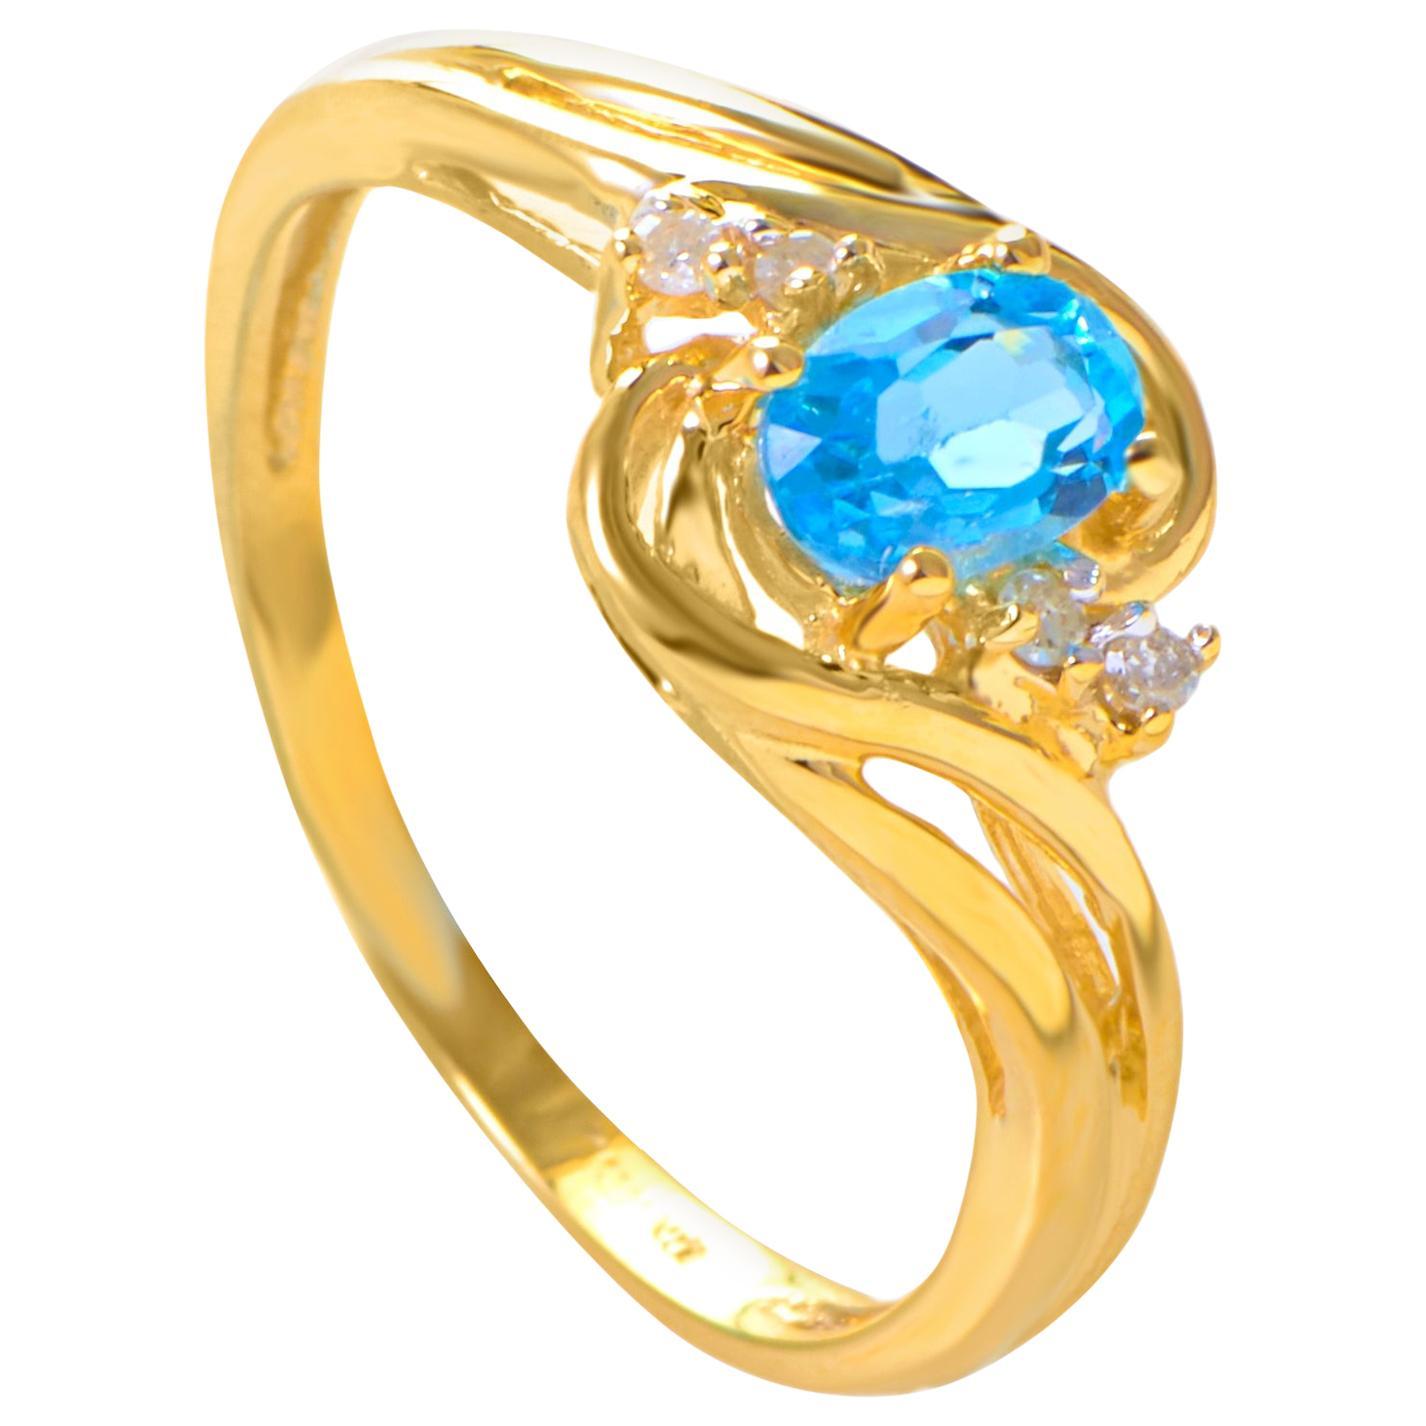 14 Karat Yellow Gold Diamond and Topaz Ring